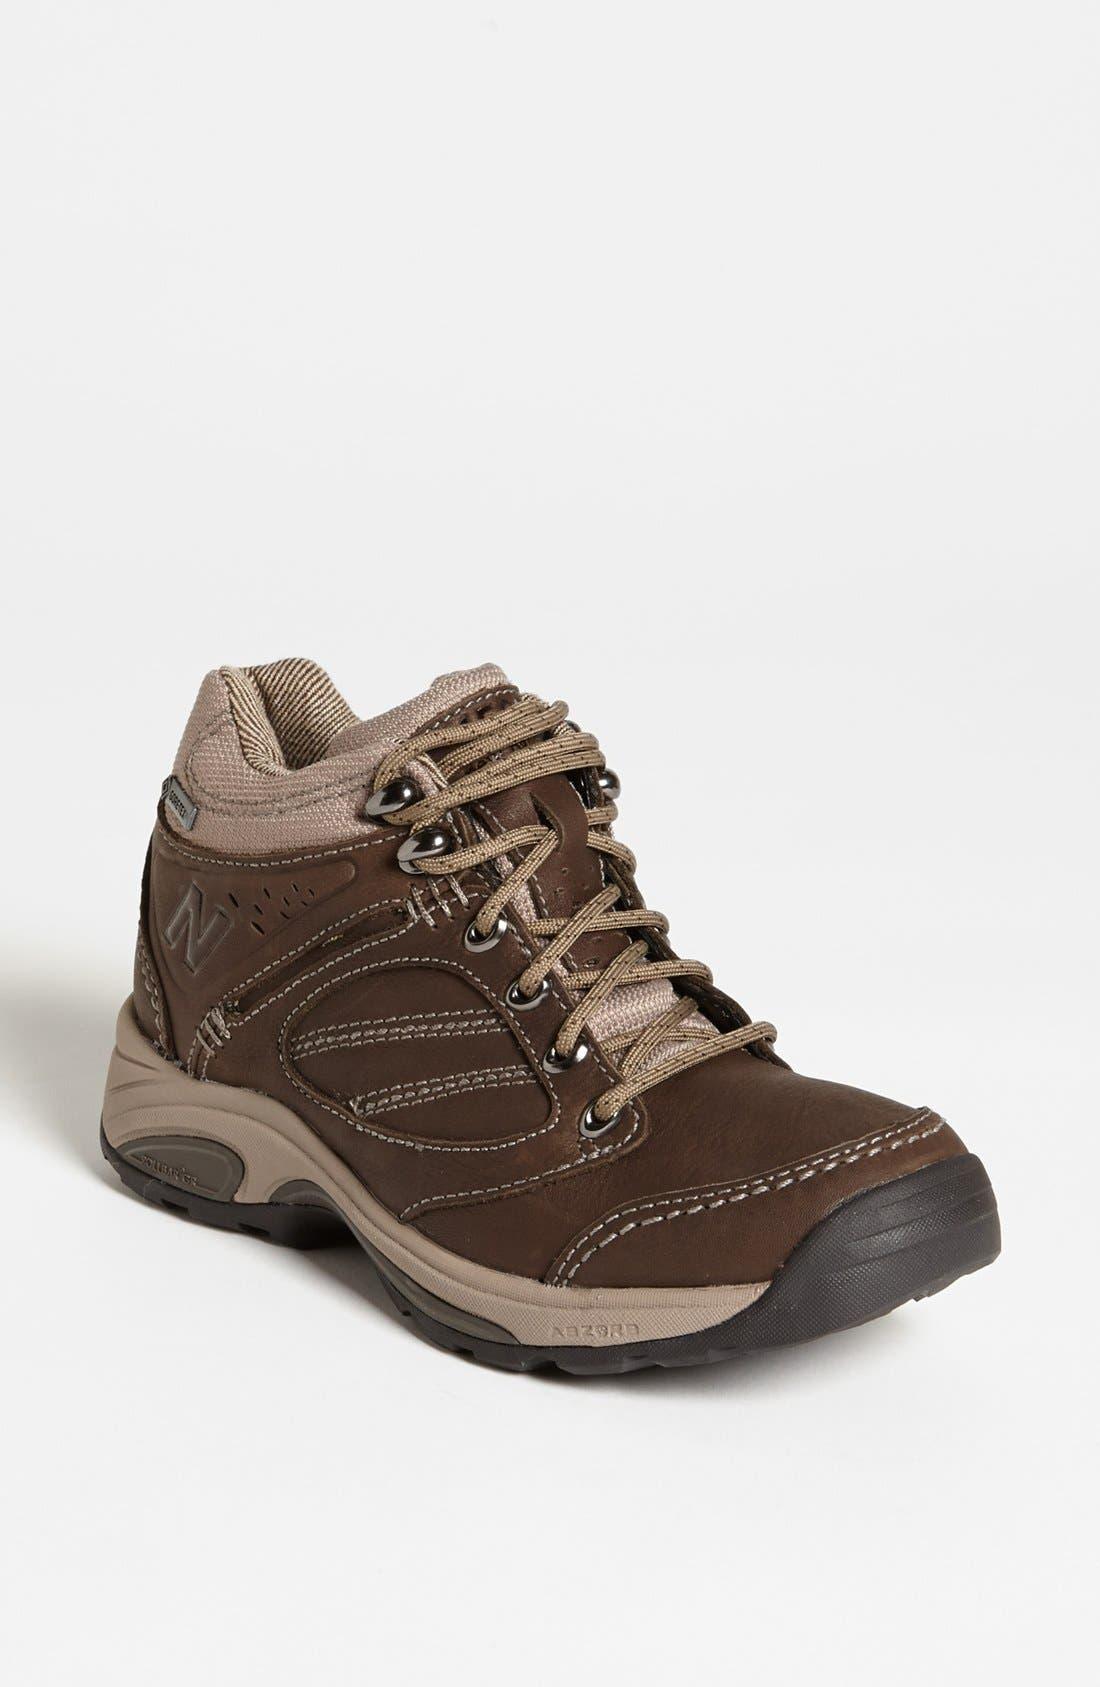 Alternate Image 1 Selected - New Balance '1569' Walking Shoe (Women)